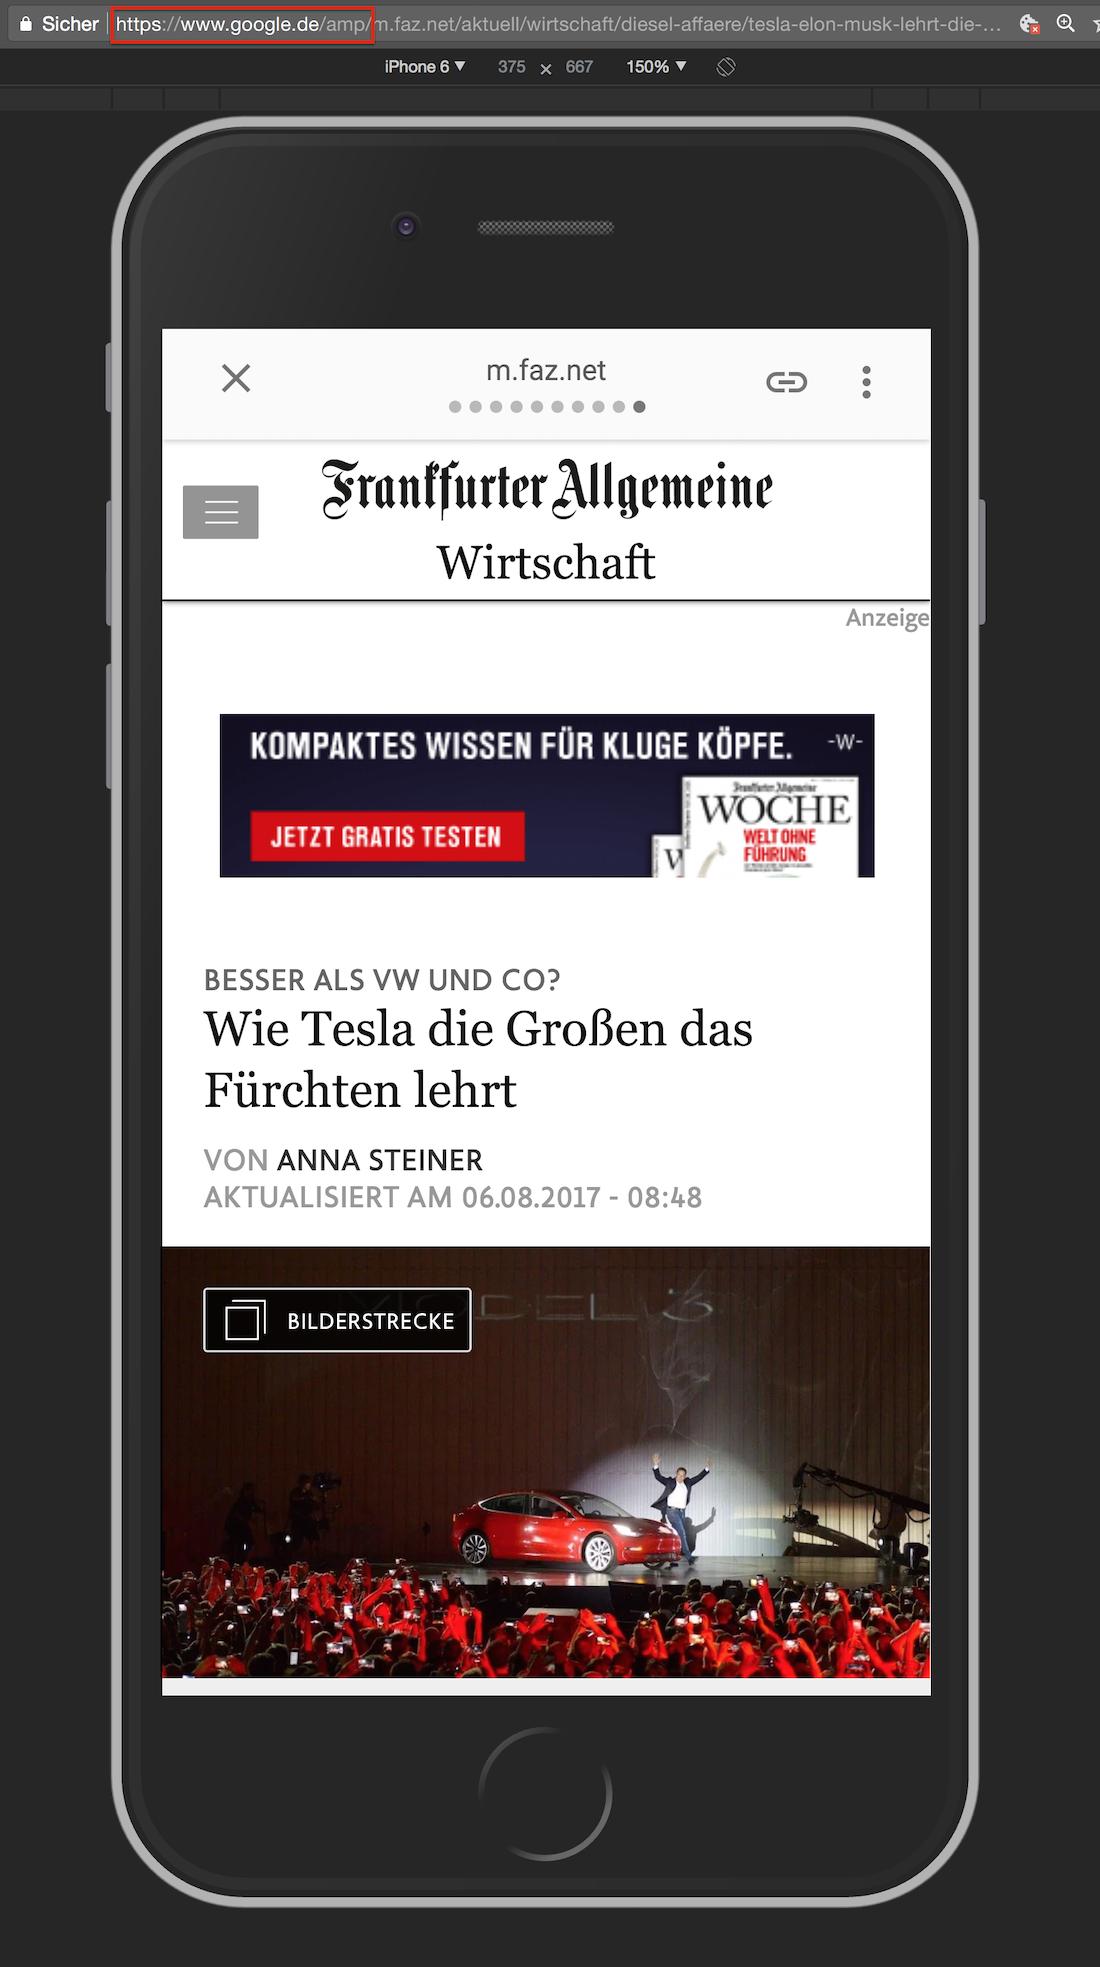 Mobiel Screenshot der FAZ auf der URL www.google.de/amp/...